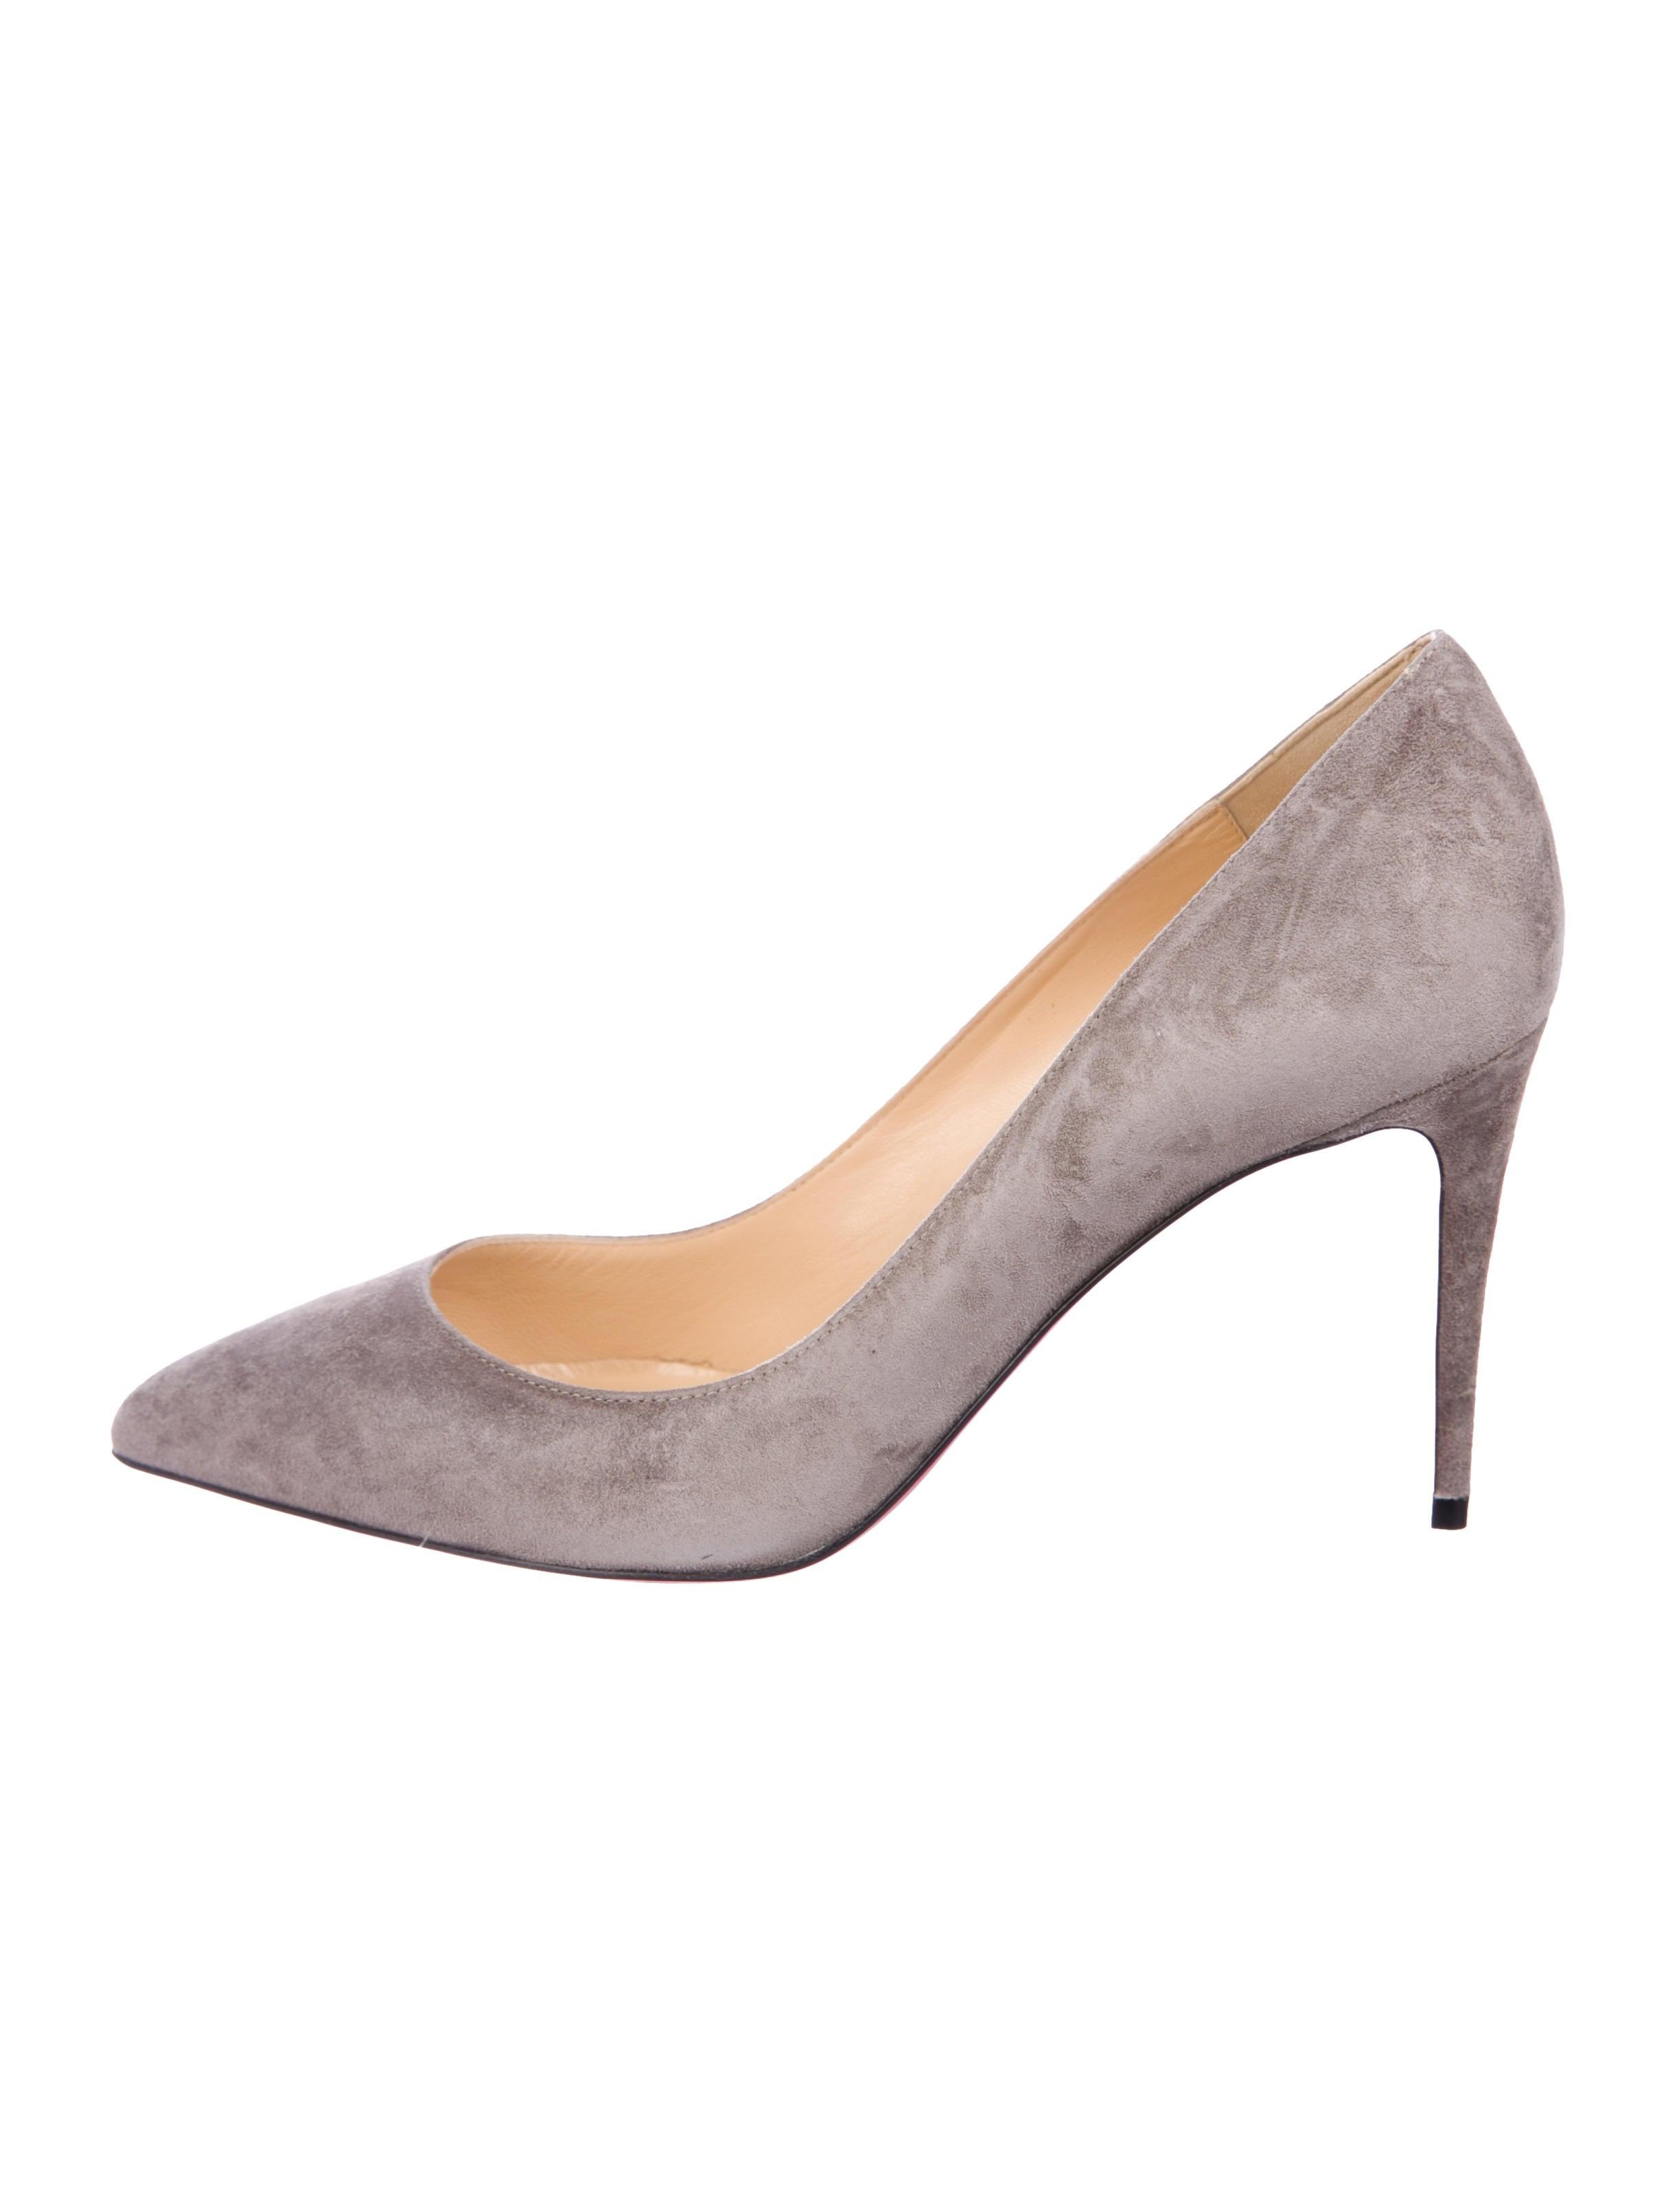 02ddca8bcf48 Christian Louboutin Pigalle Follies 85 Suede Pumps w  Tags - Shoes ...